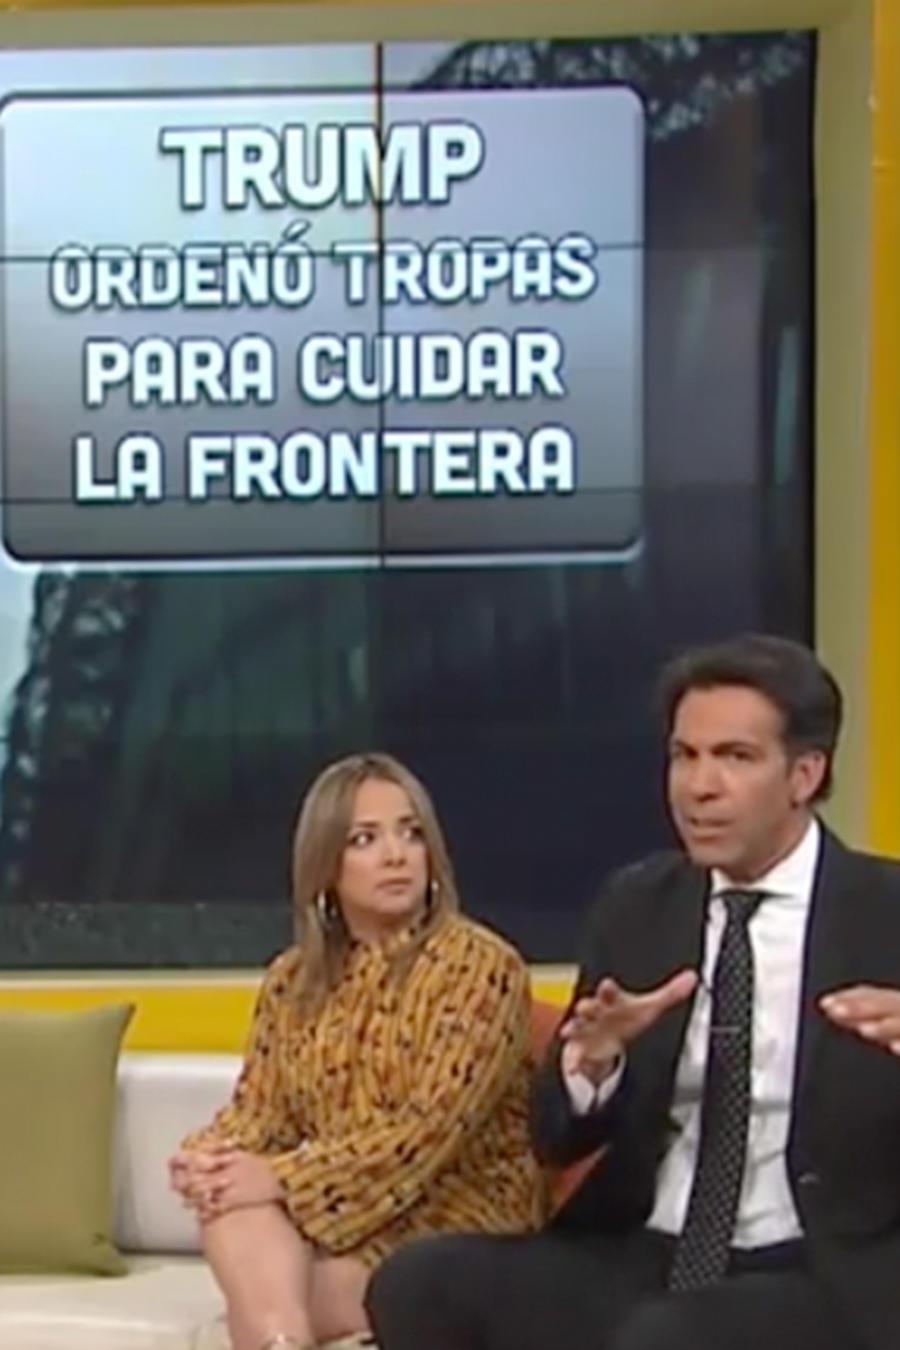 Comenzó la llegada de tropas de la Guardia Nacional a la frontera con México